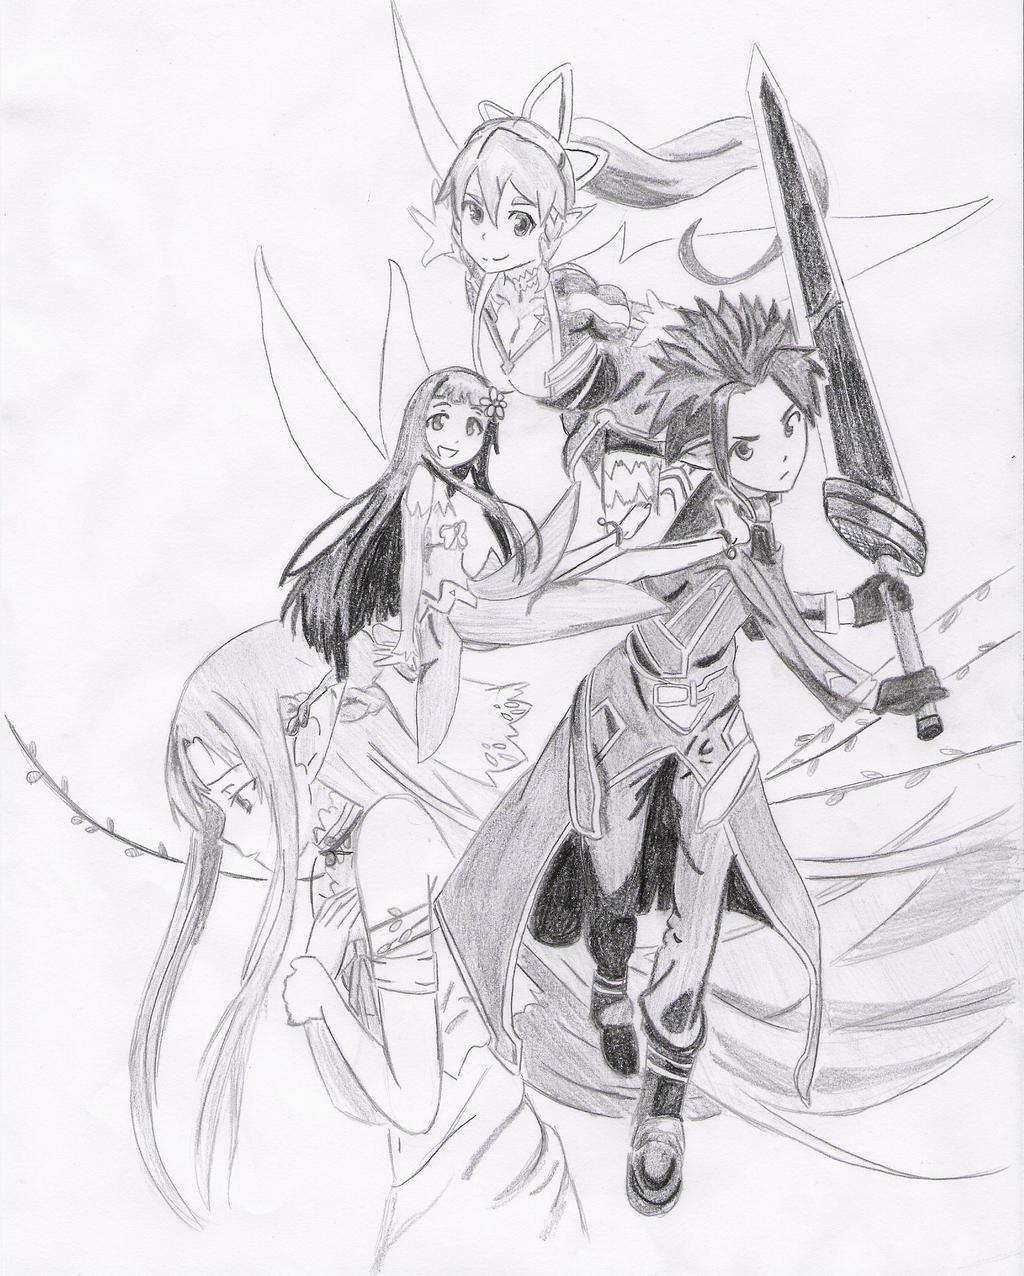 Sword Art Online (Kirito, Asuna, Yui and Leafa) by Mitsusuki